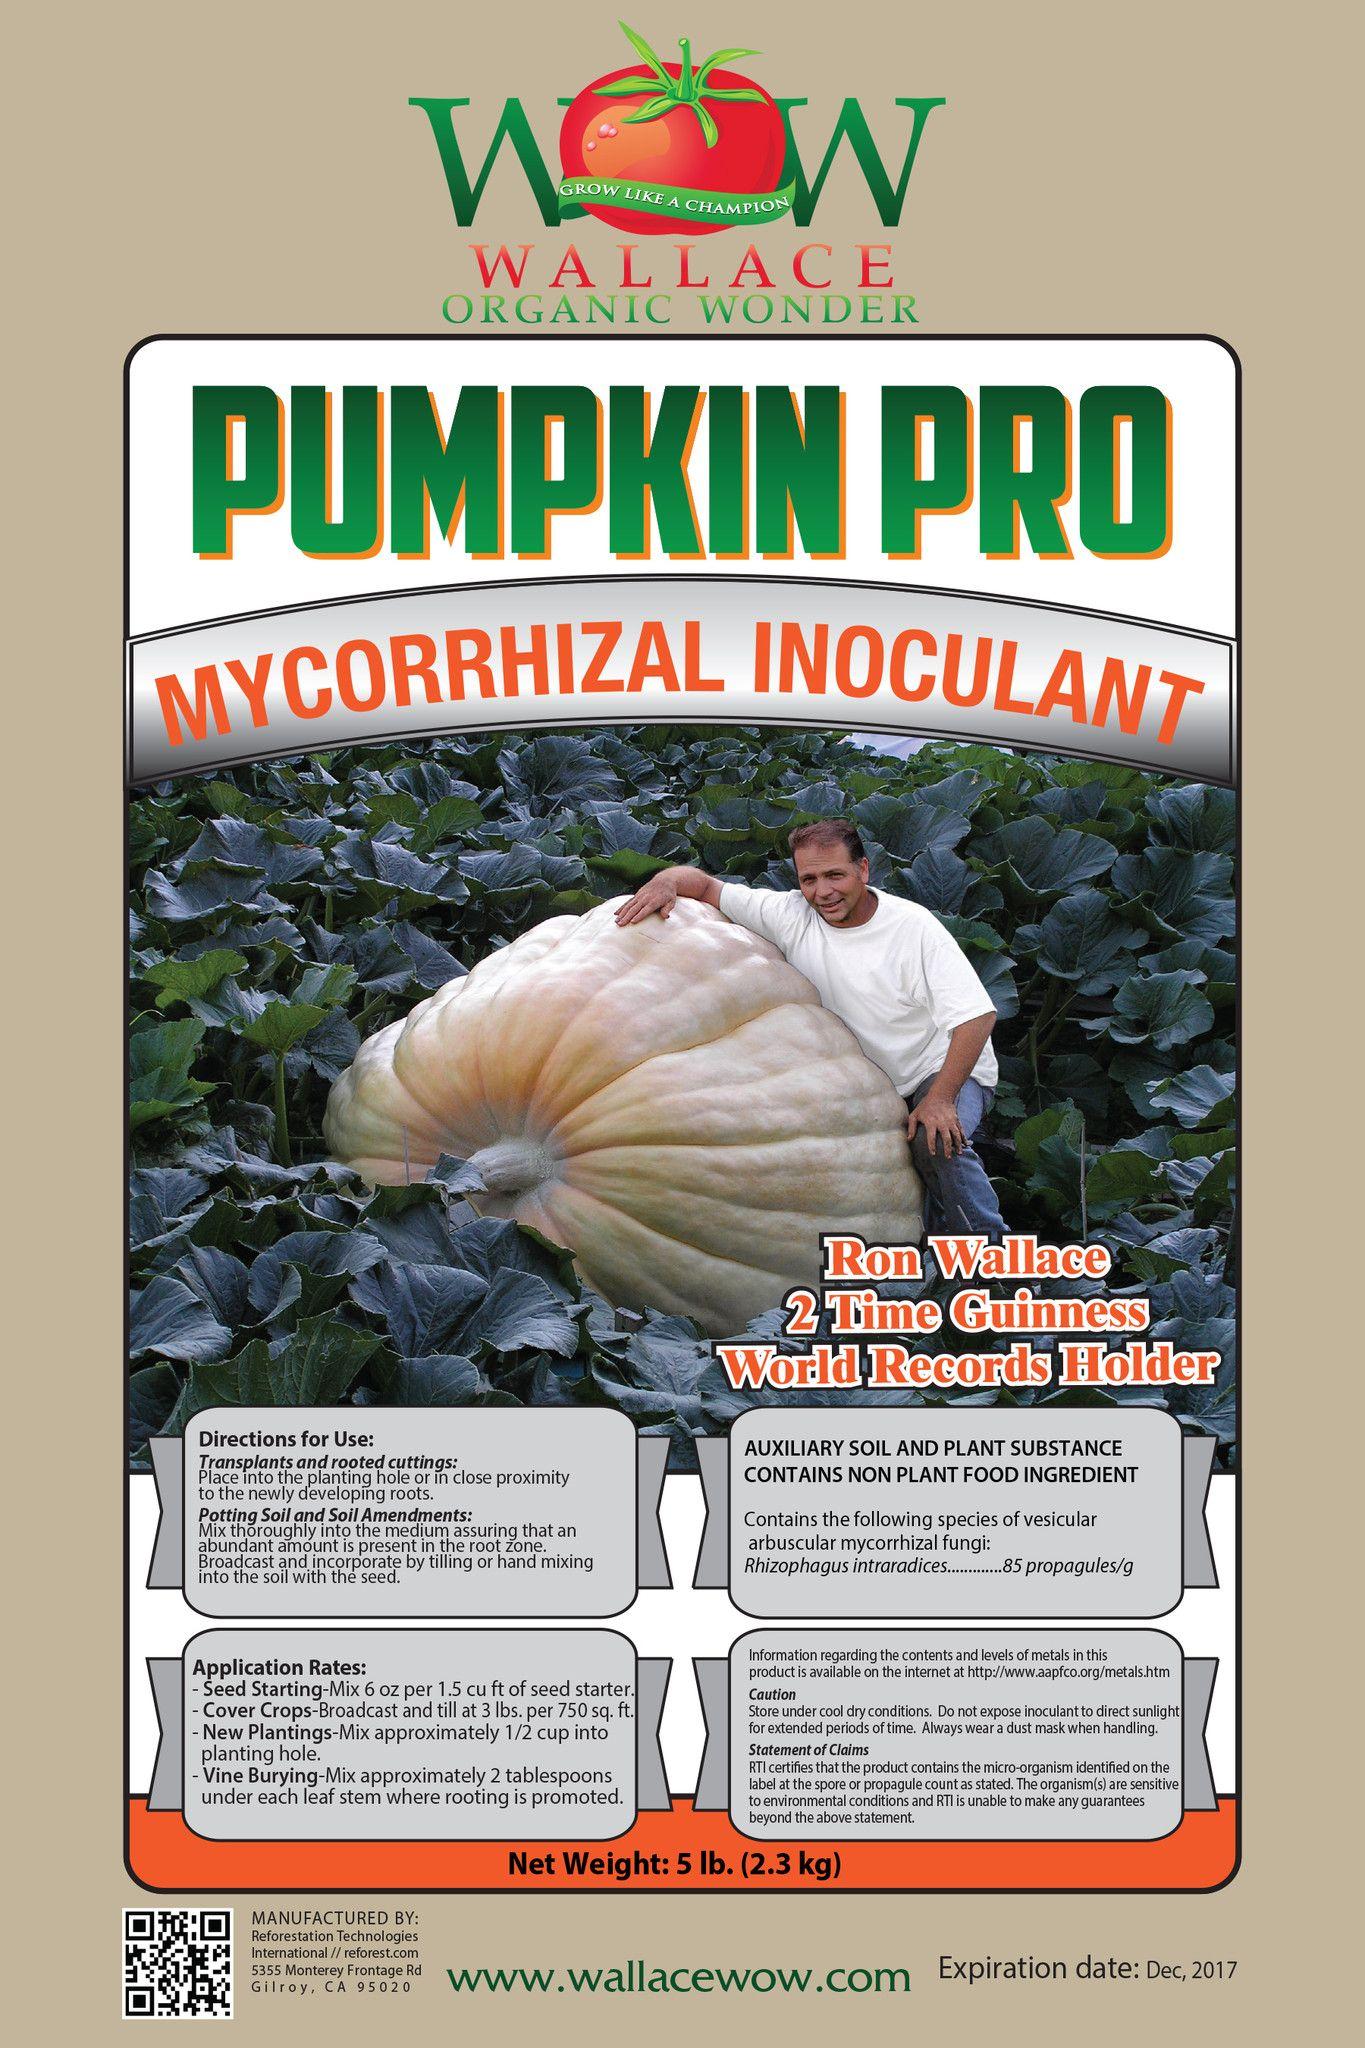 Premium Mycorrhizal Inoculant Mycorrhizae 1 5 10 20 400 x 300